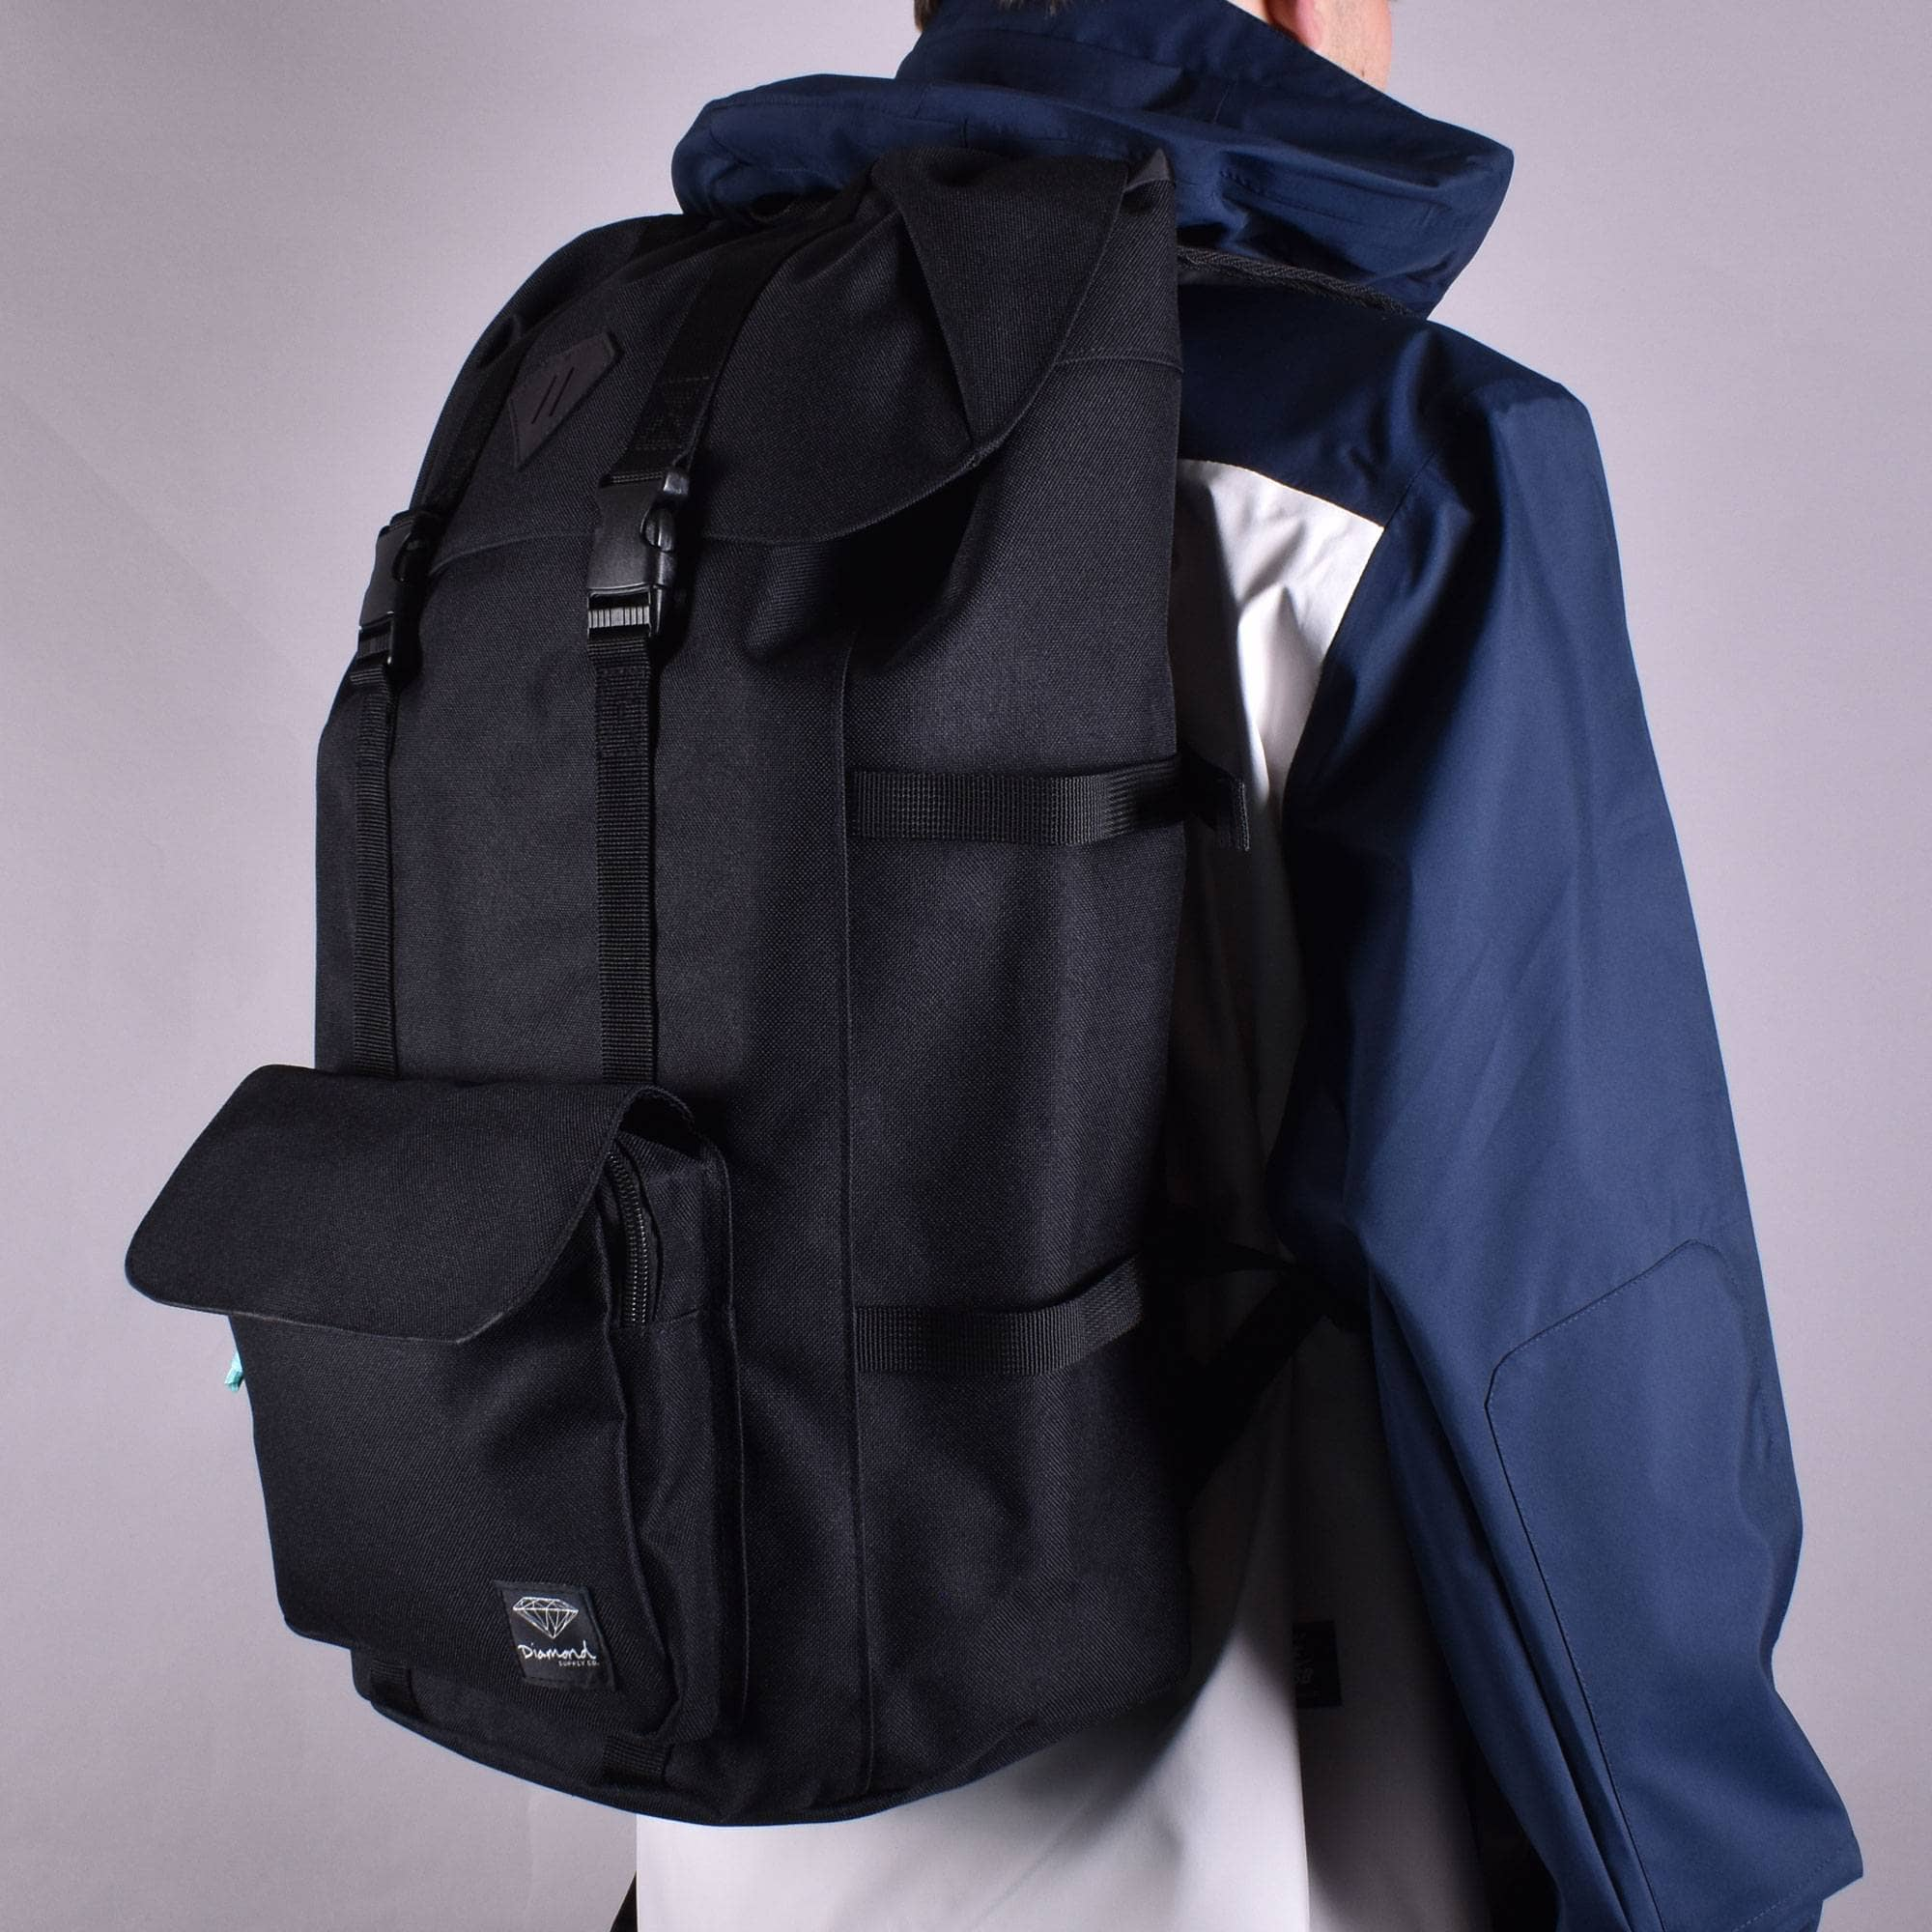 Life Black mens laptop pad backpack bag BACK TO SCHOOL Diamond supply co